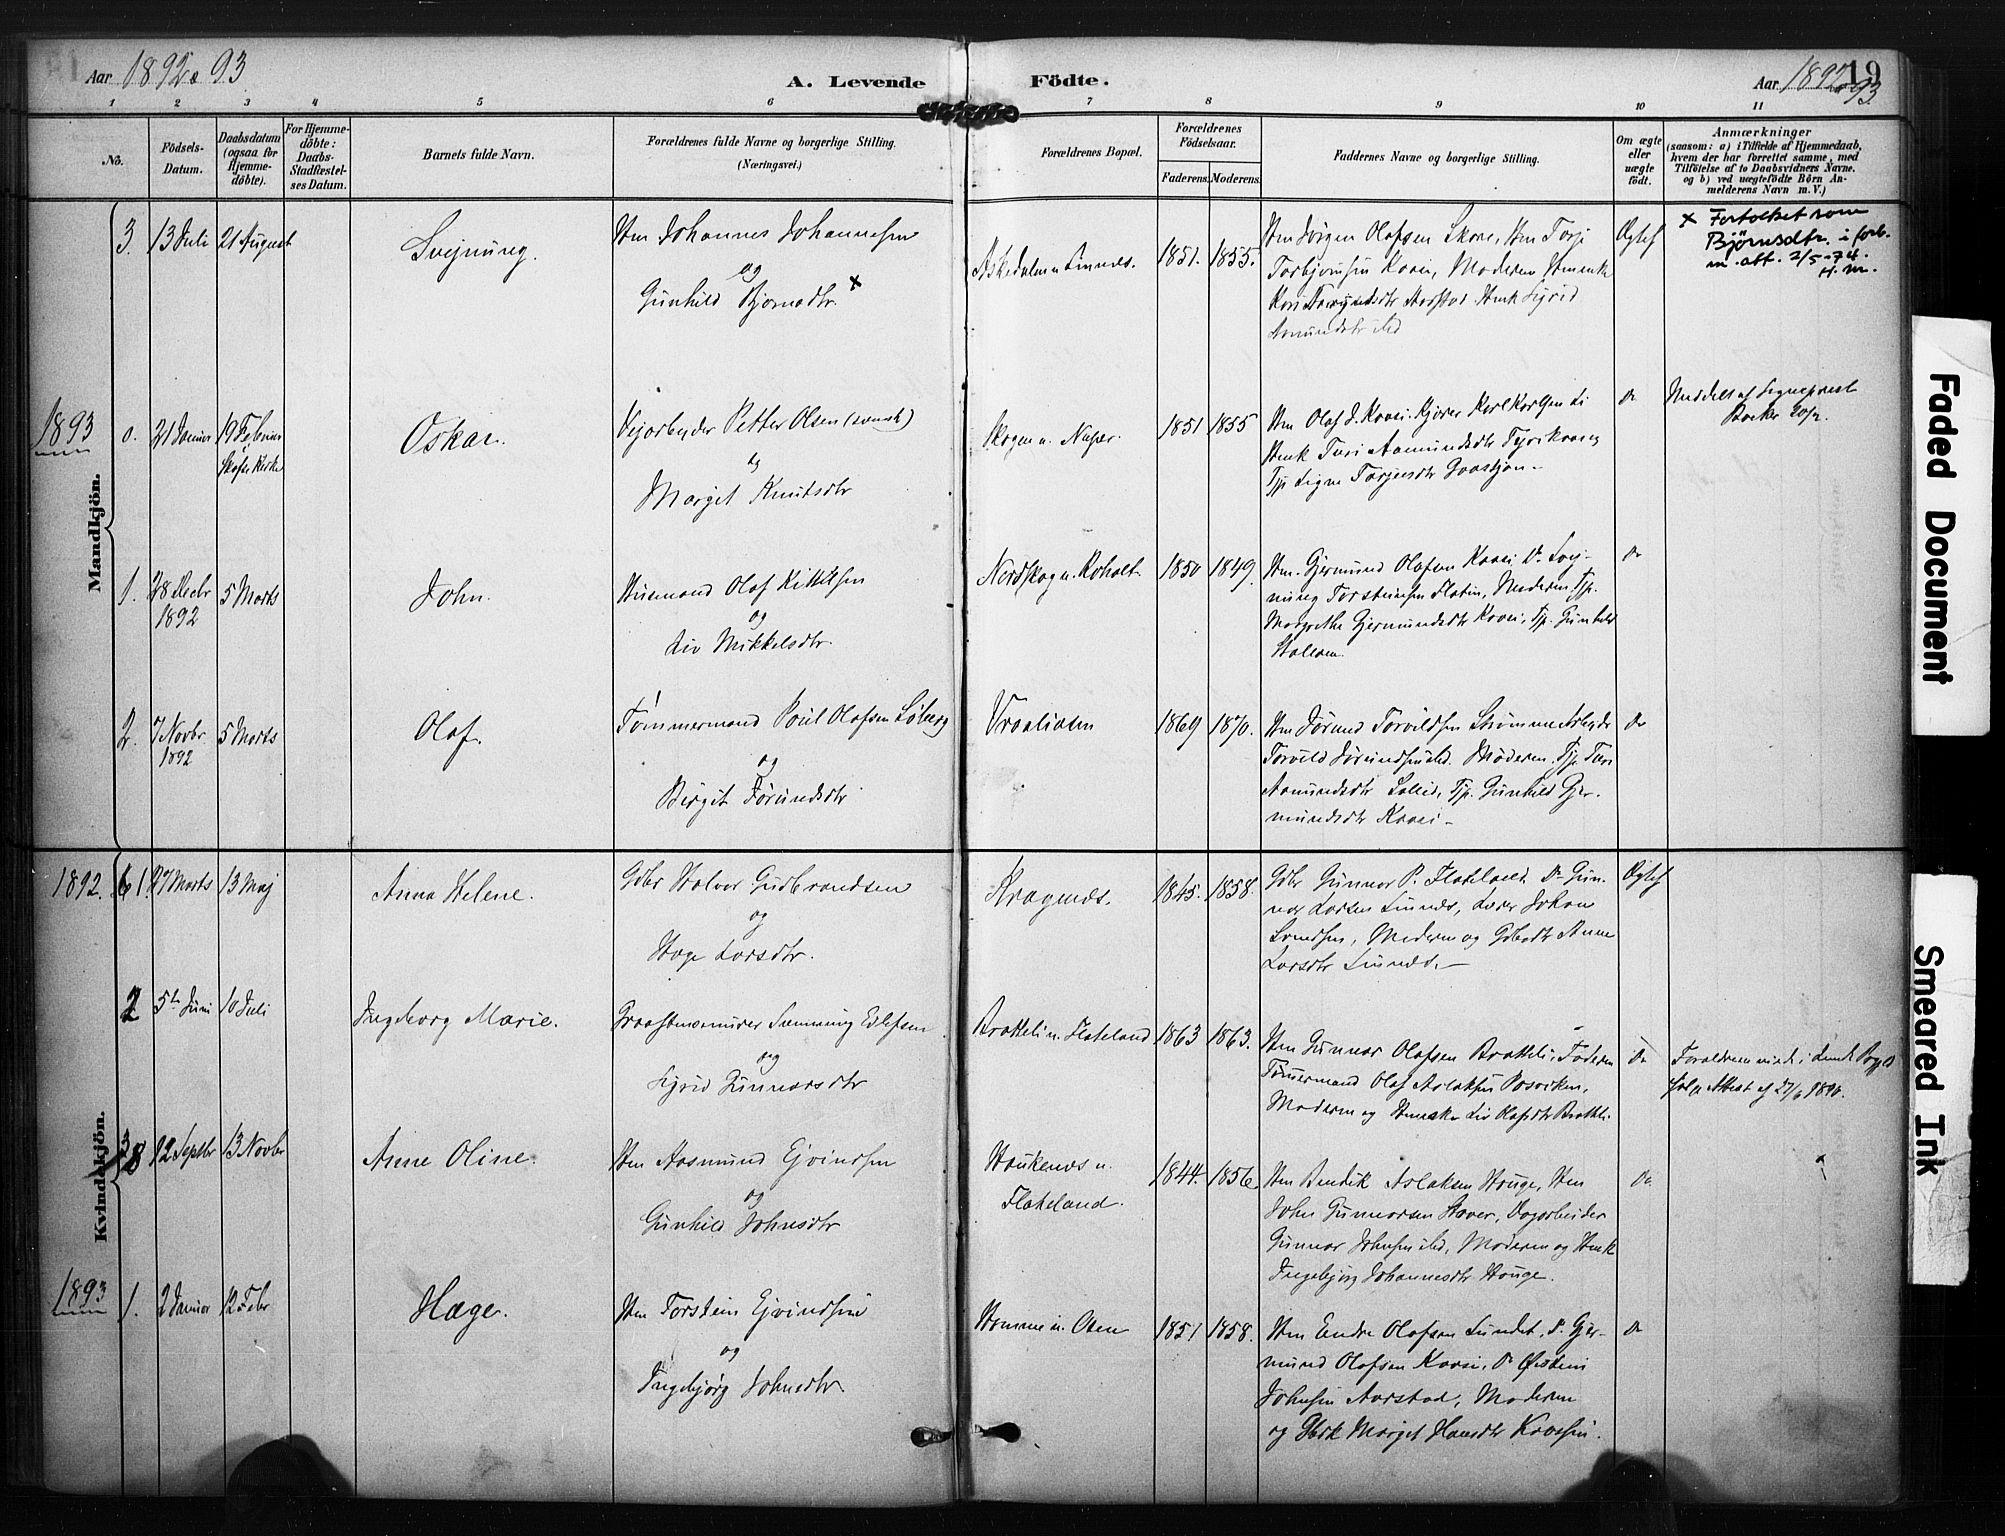 SAKO, Kviteseid kirkebøker, F/Fc/L0002: Ministerialbok nr. III 2, 1882-1908, s. 19